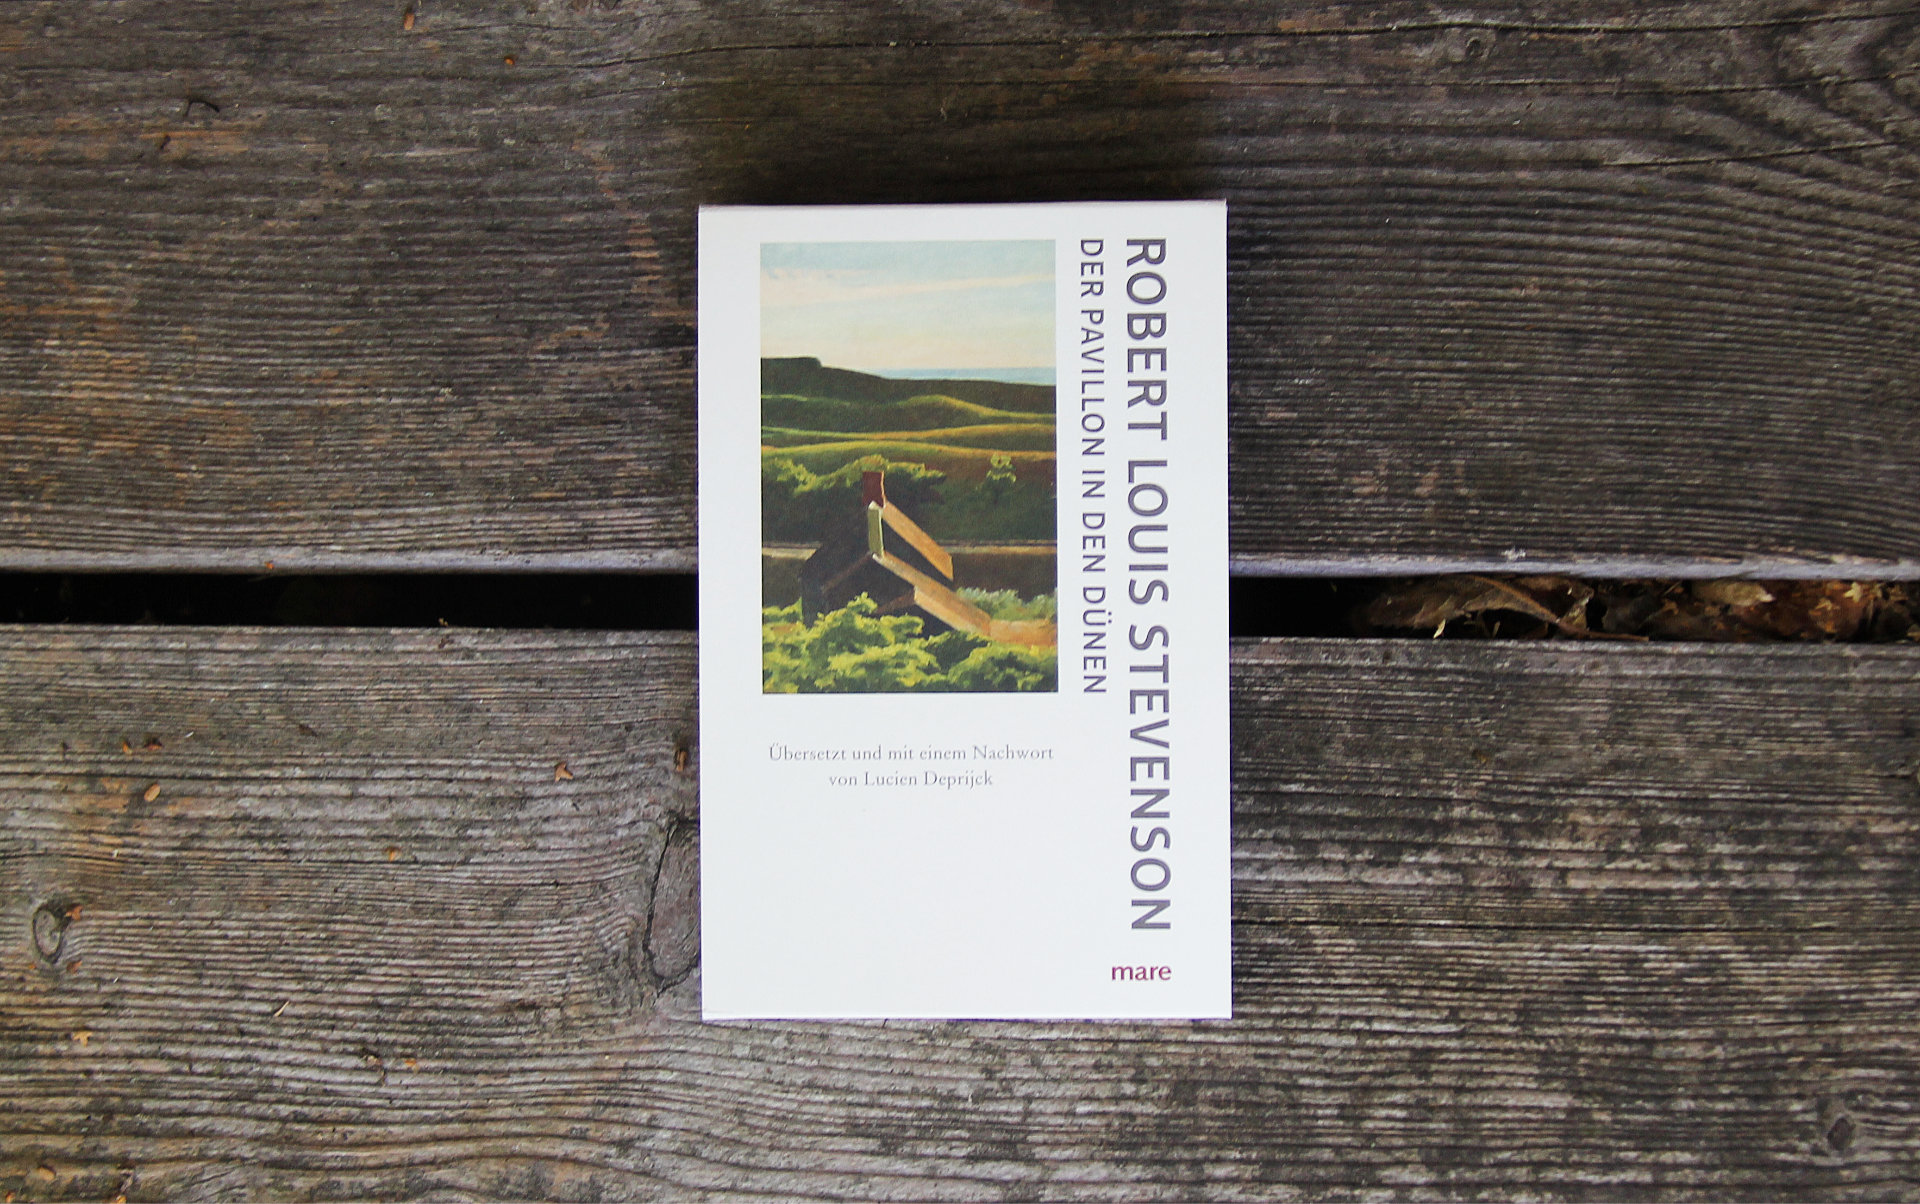 Der Pavillon in den Dünen • Robert Louis Stevenson